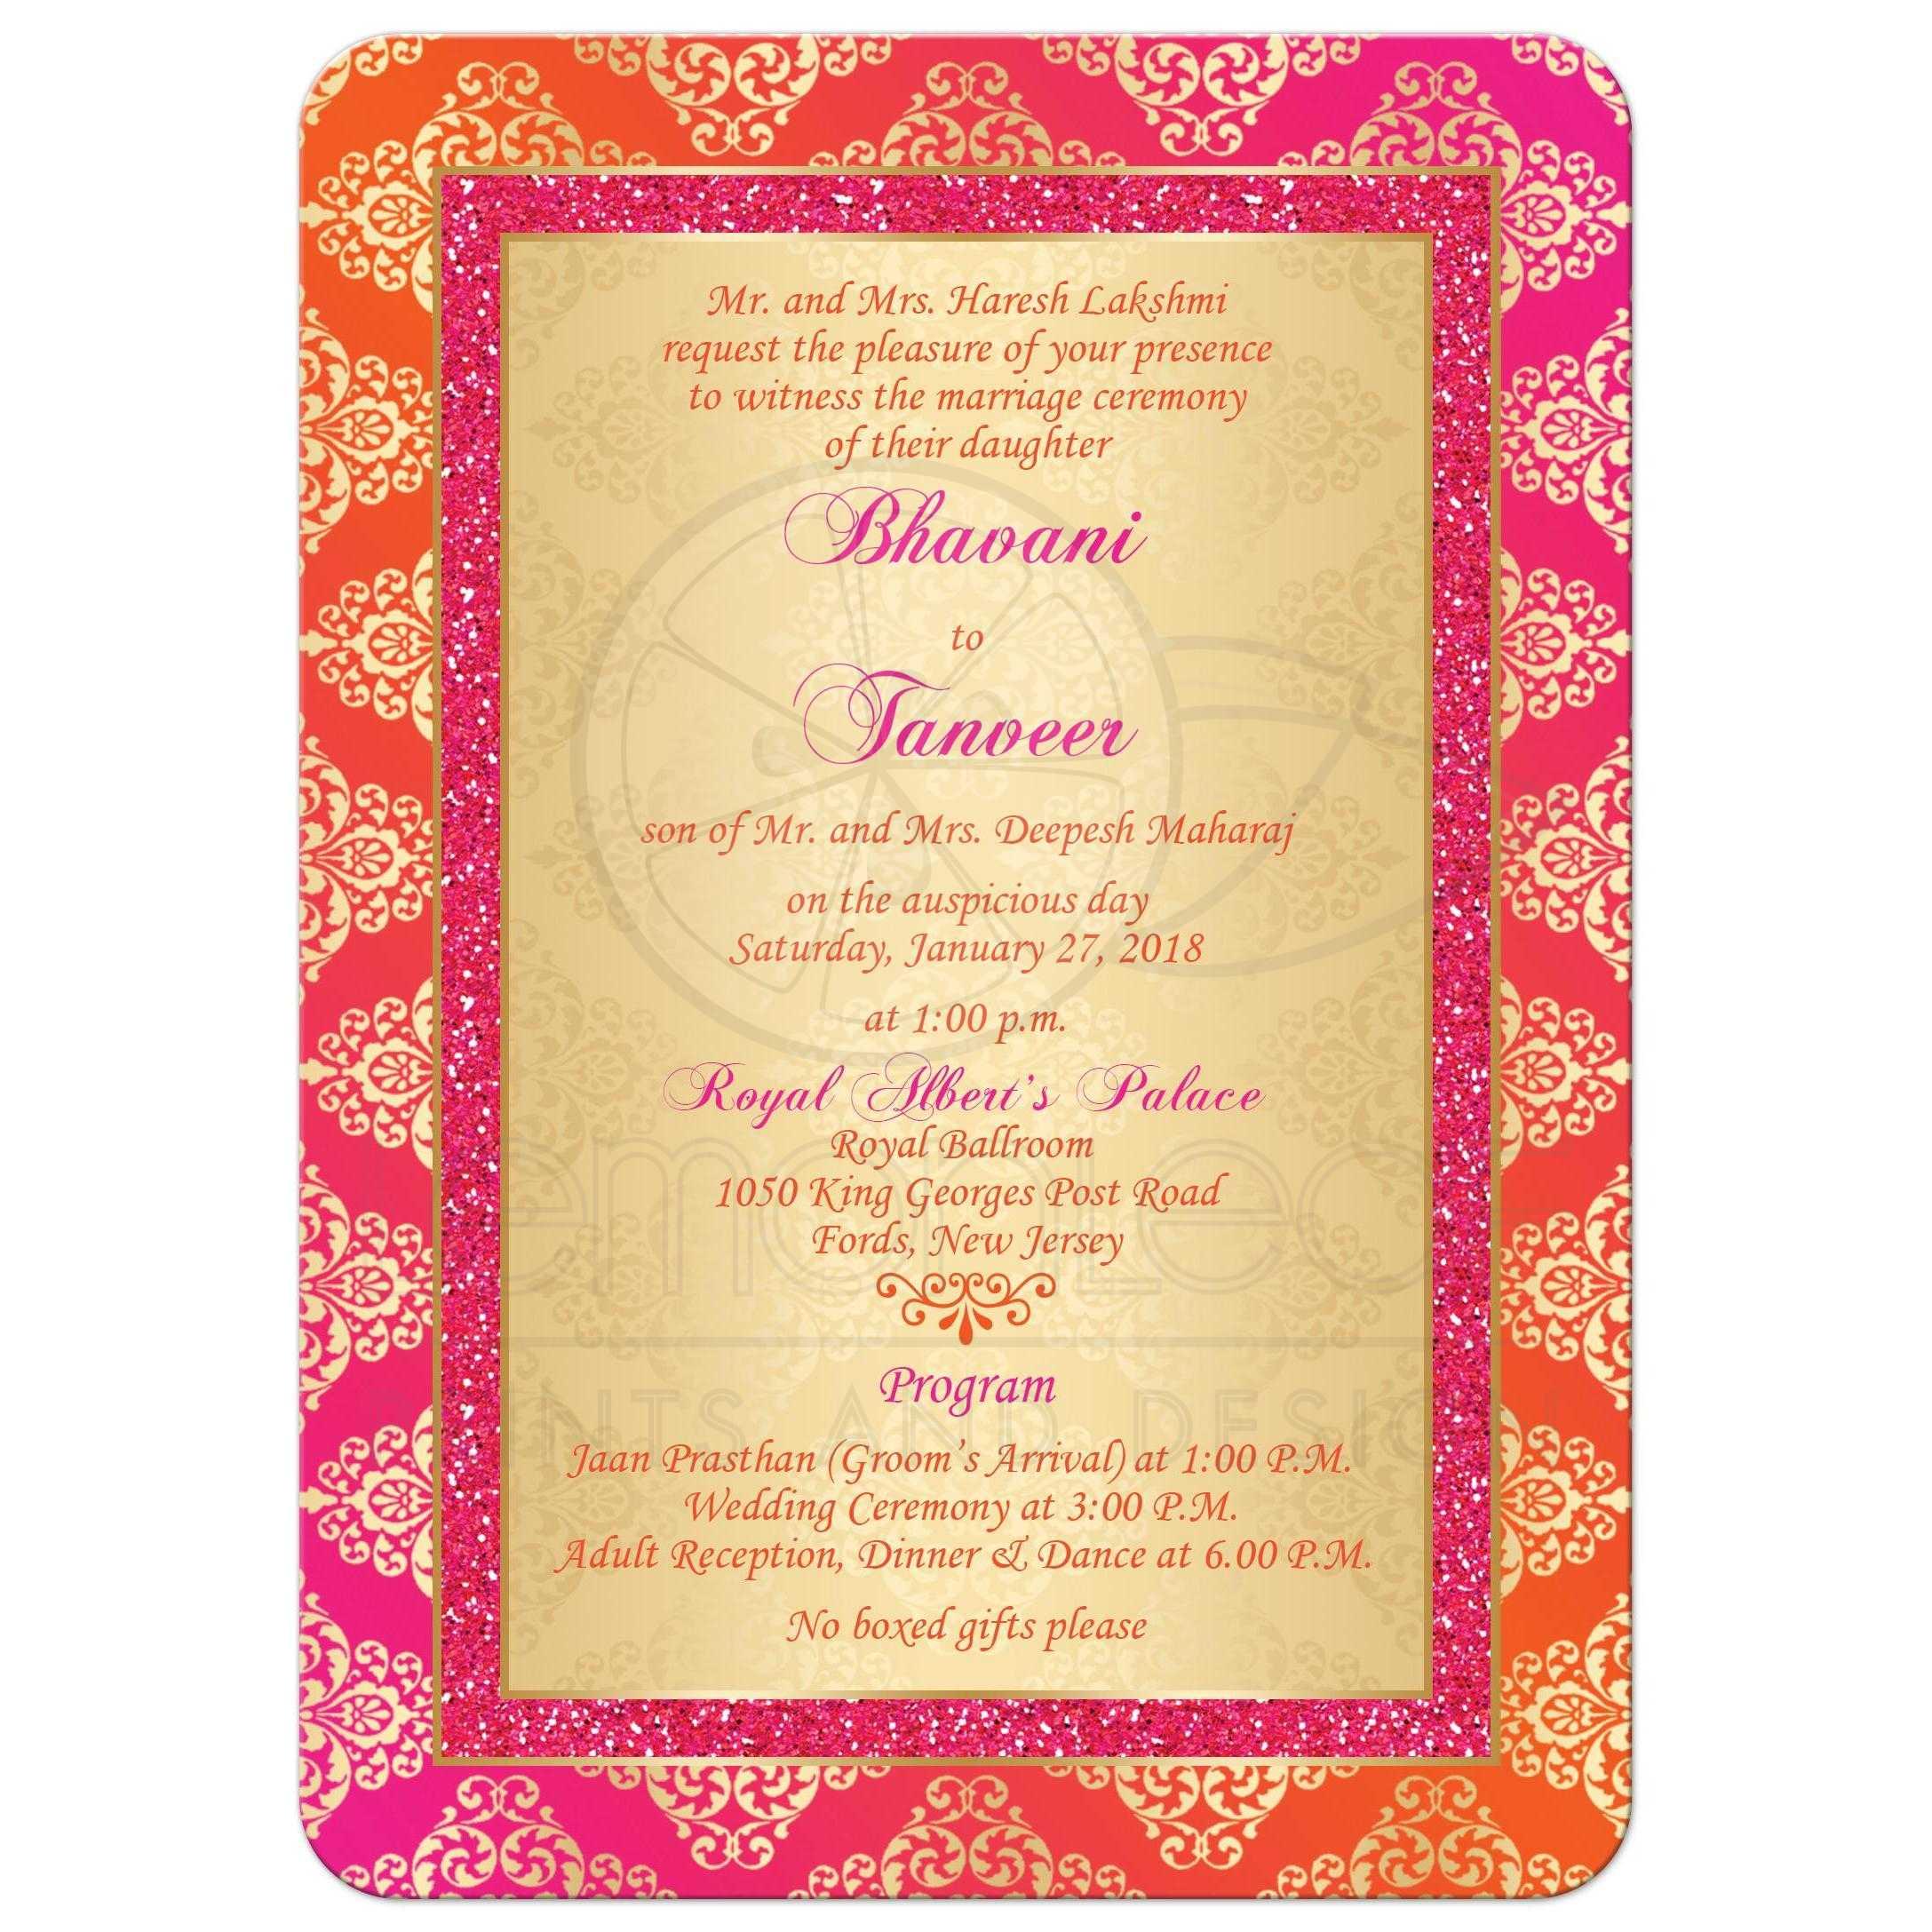 ... Indian Or Hindu Wedding Invite In Hot Fuchsia Pink, Orange And Gold  Damask ...